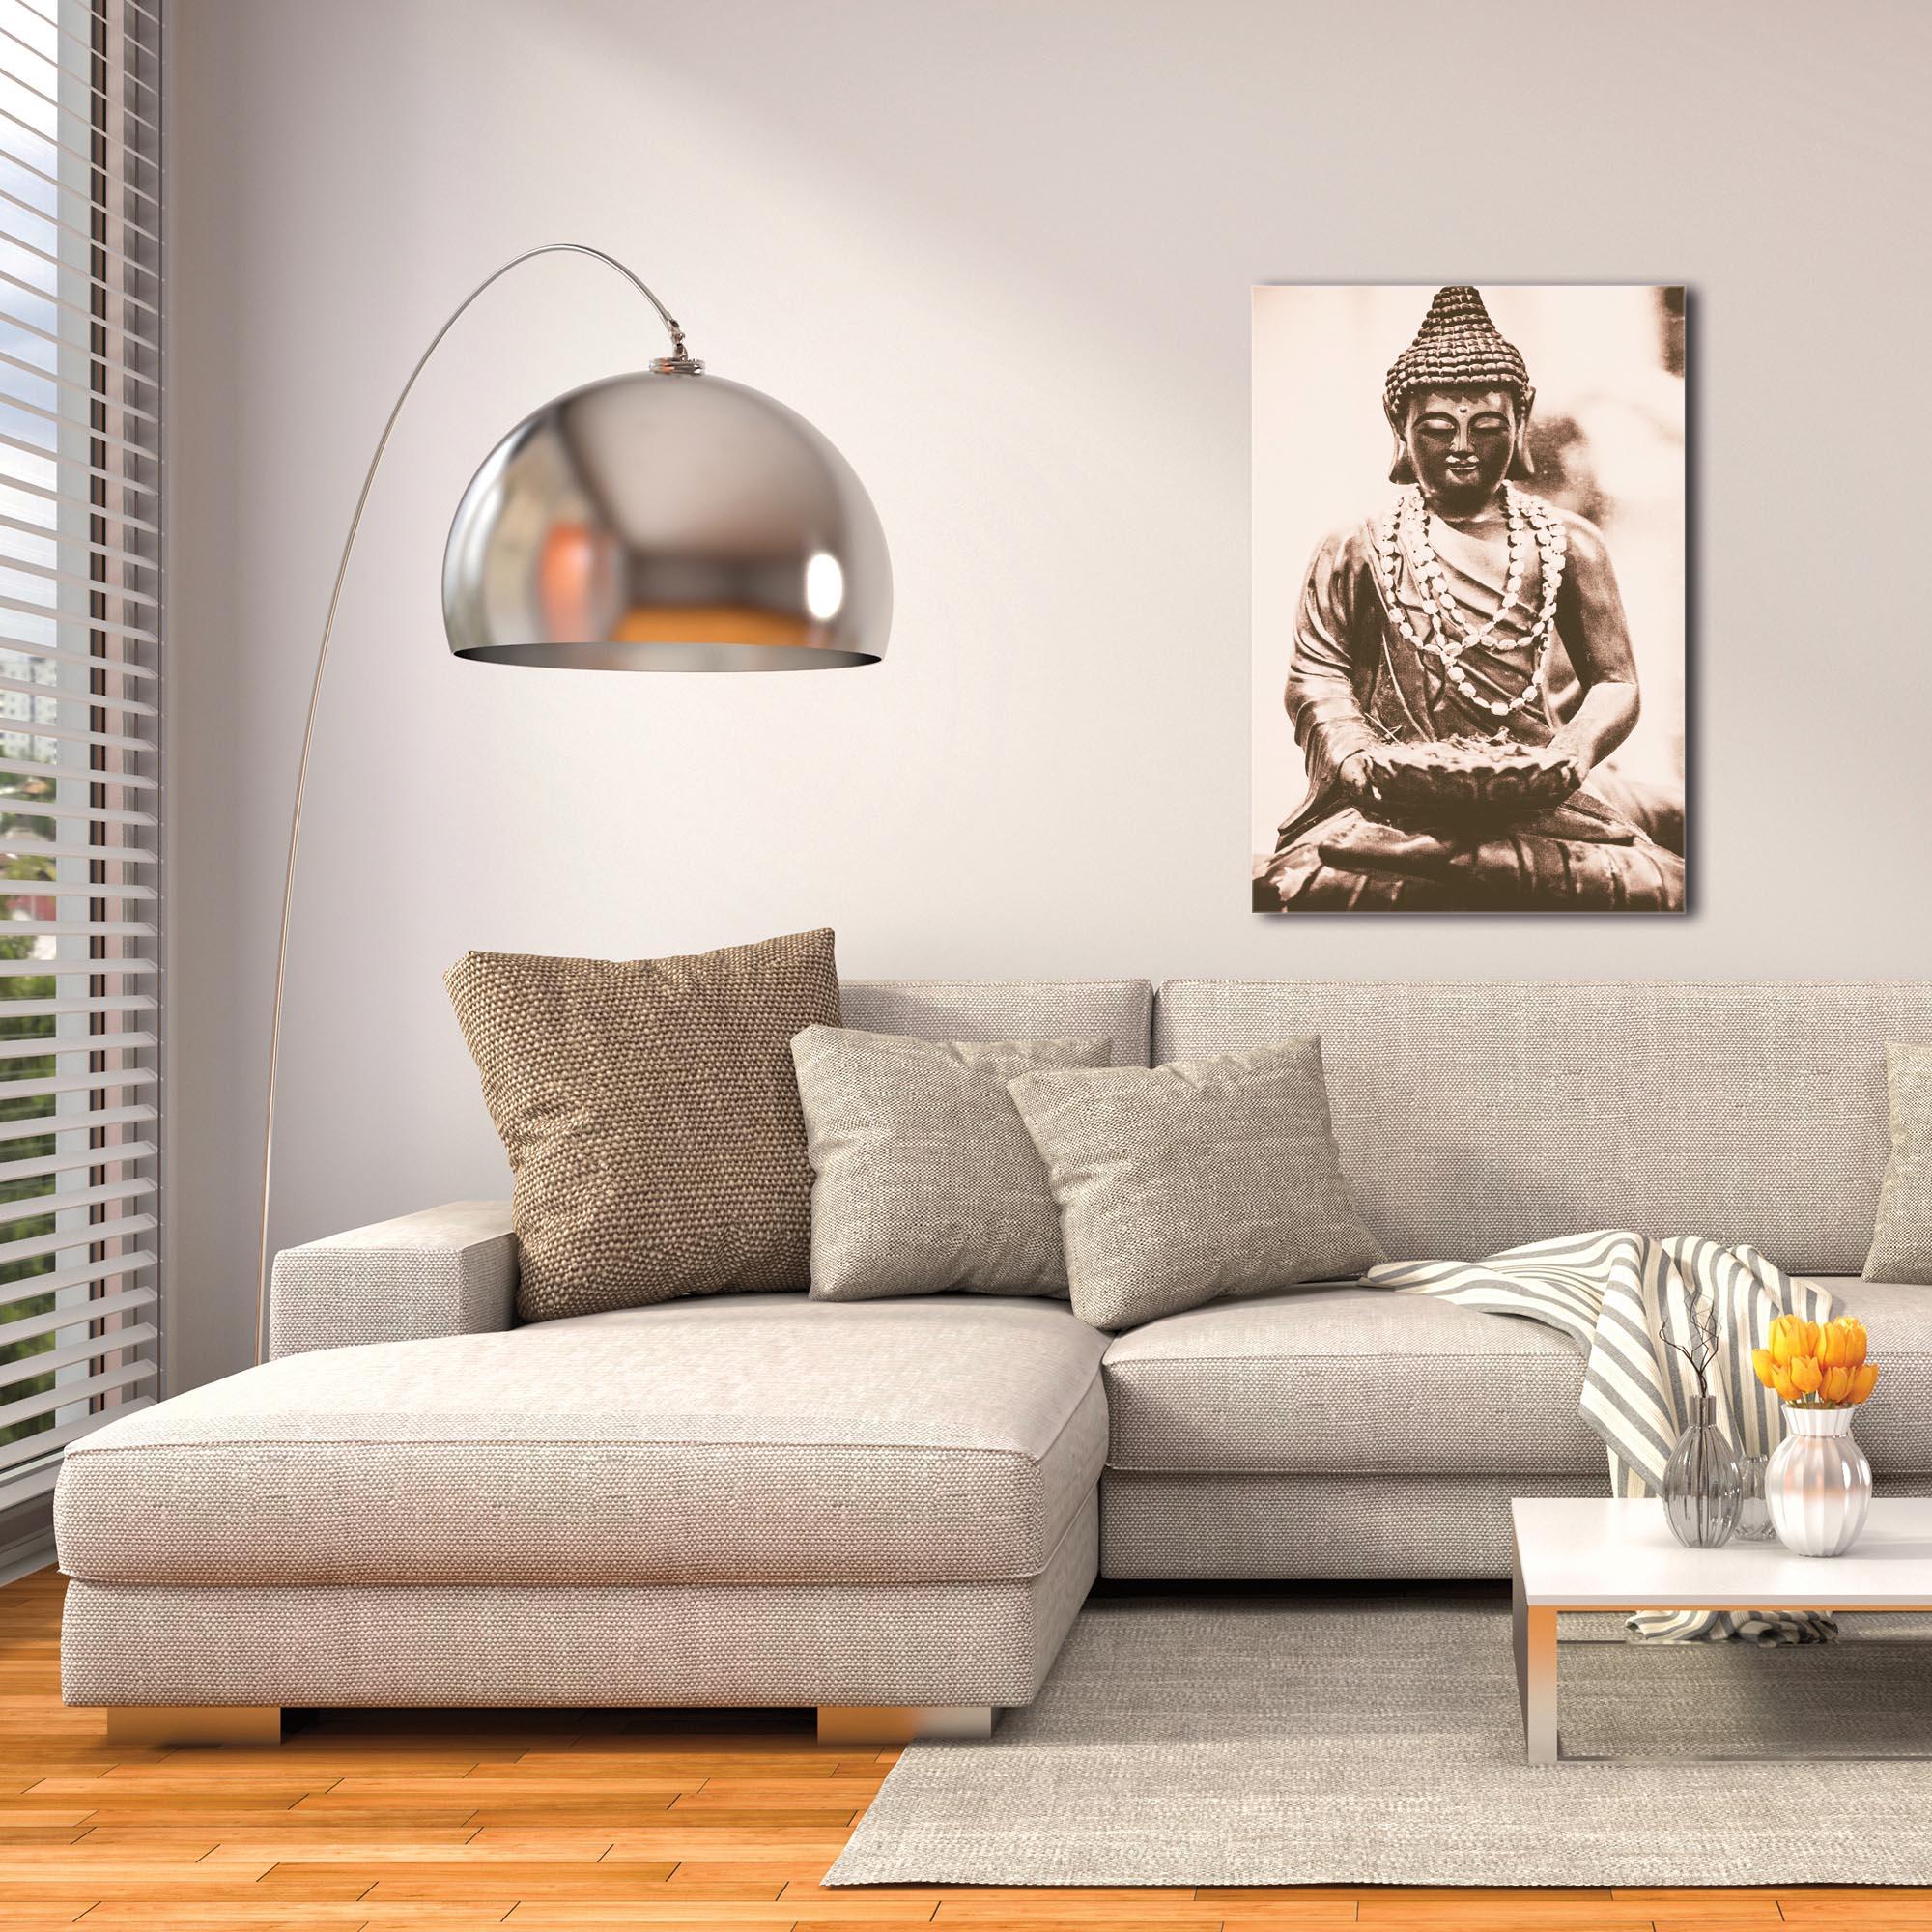 Eclectic Wall Art 'Buddha Statue' - Religion Decor on Metal or Plexiglass - Image 3